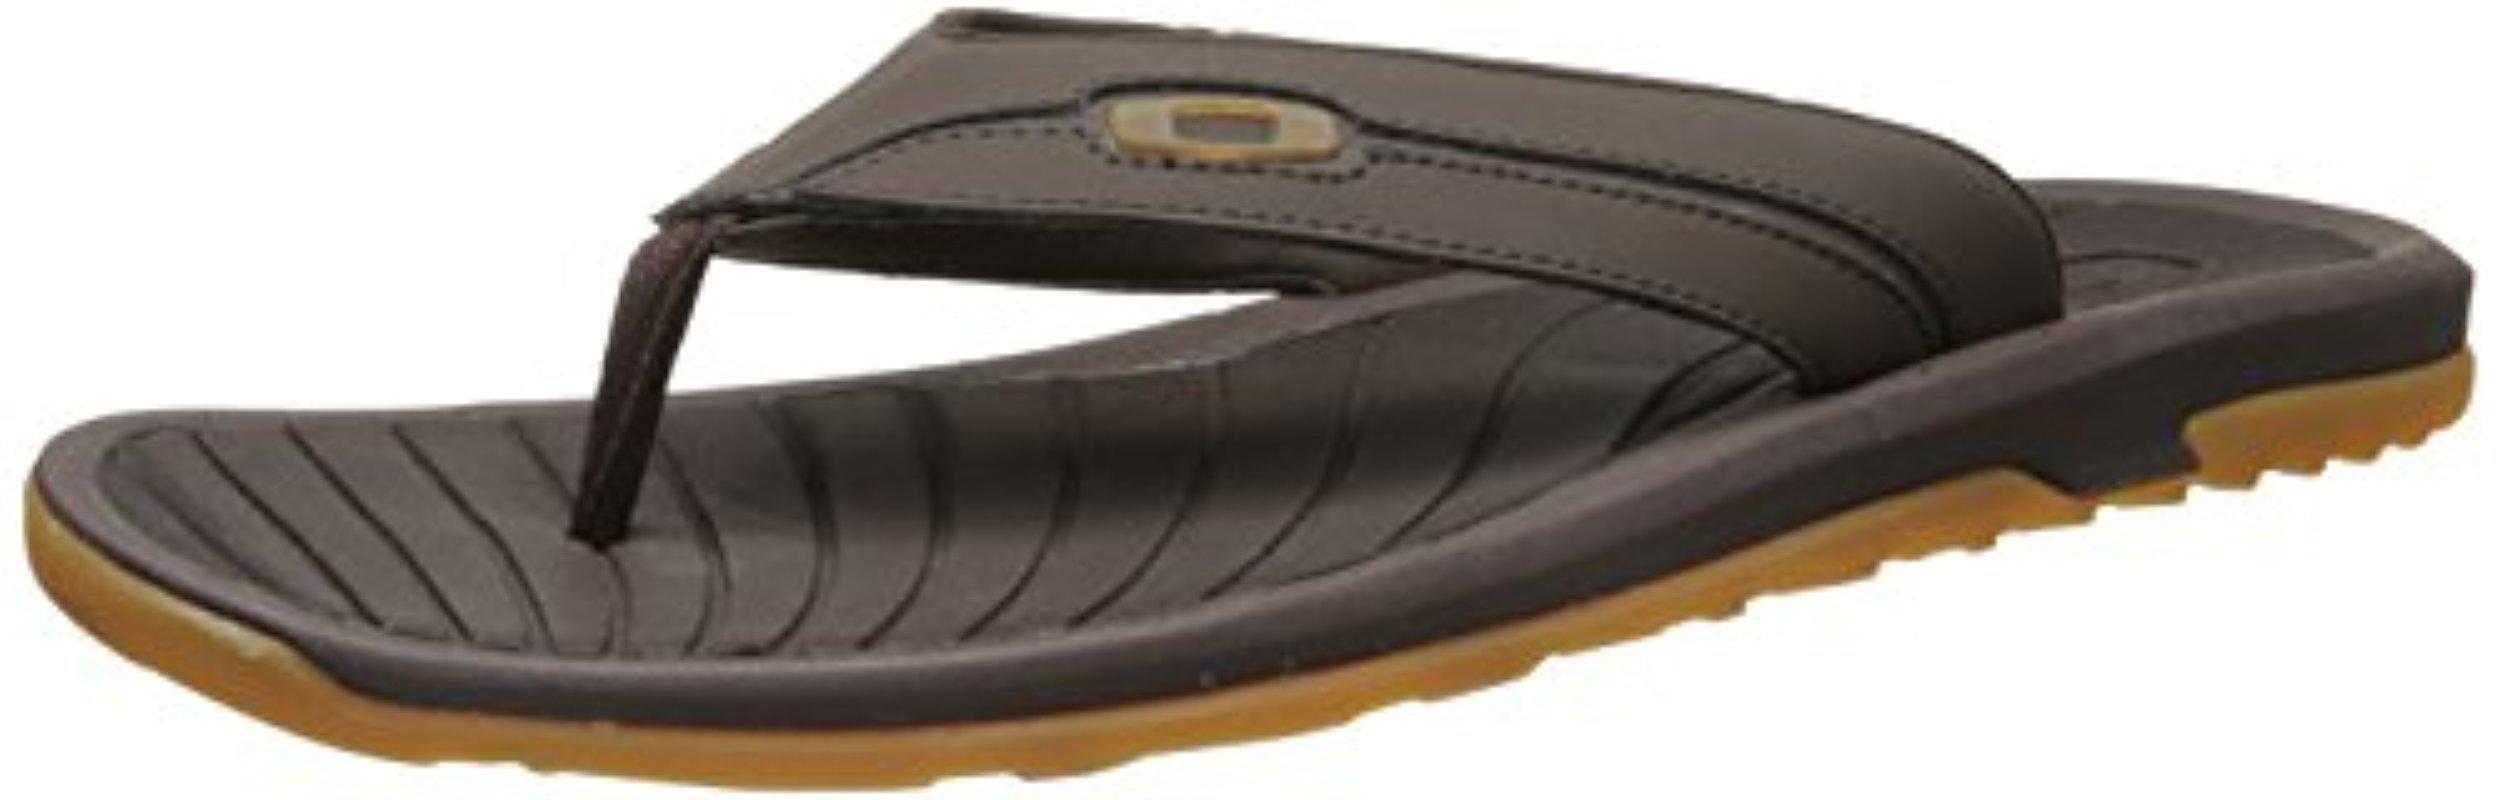 13b1066fbb088 Lyst - Oakley Dune Sandal in Brown for Men